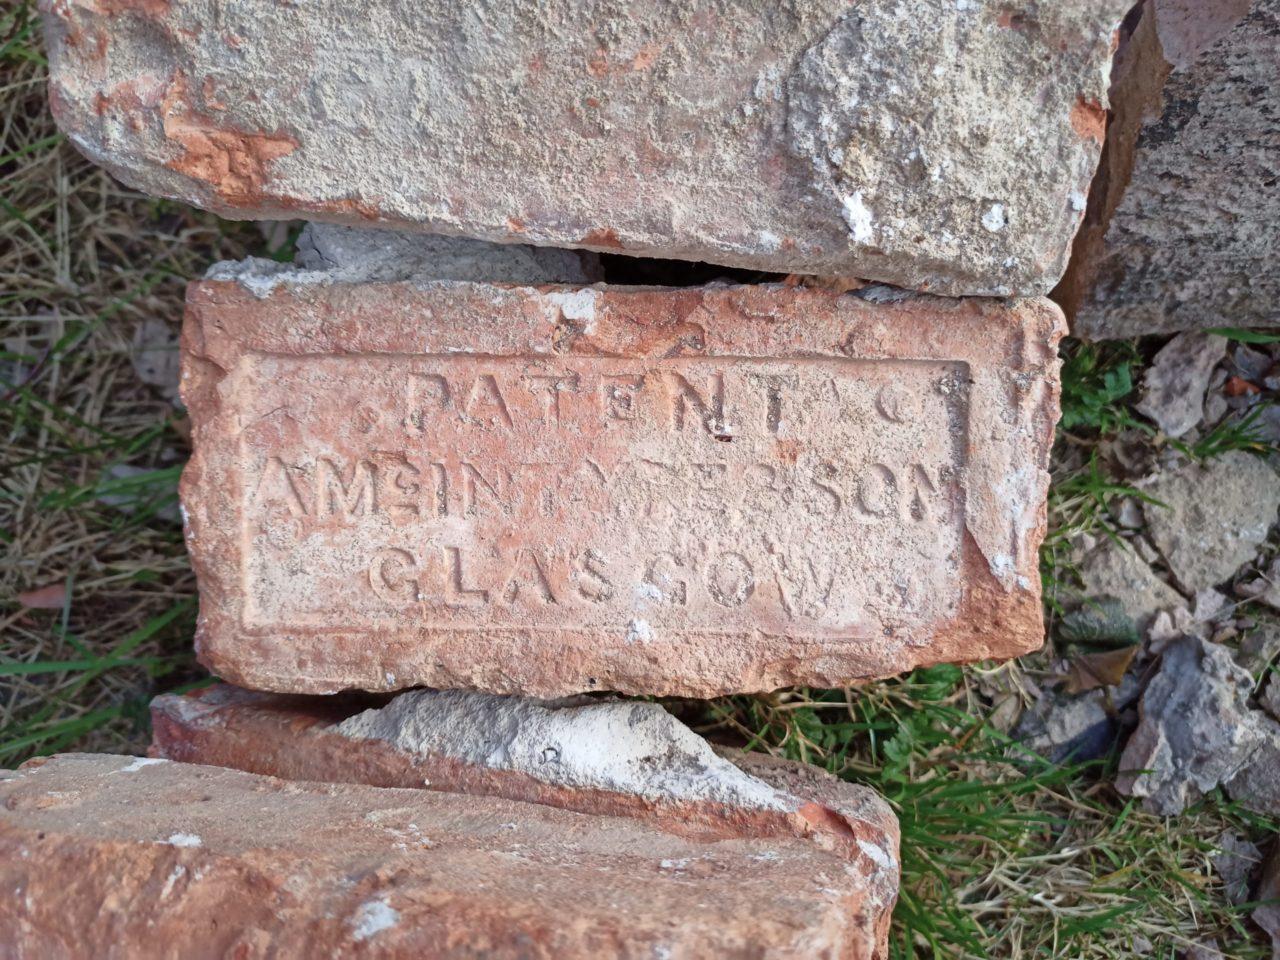 A McIntyre & Son brick